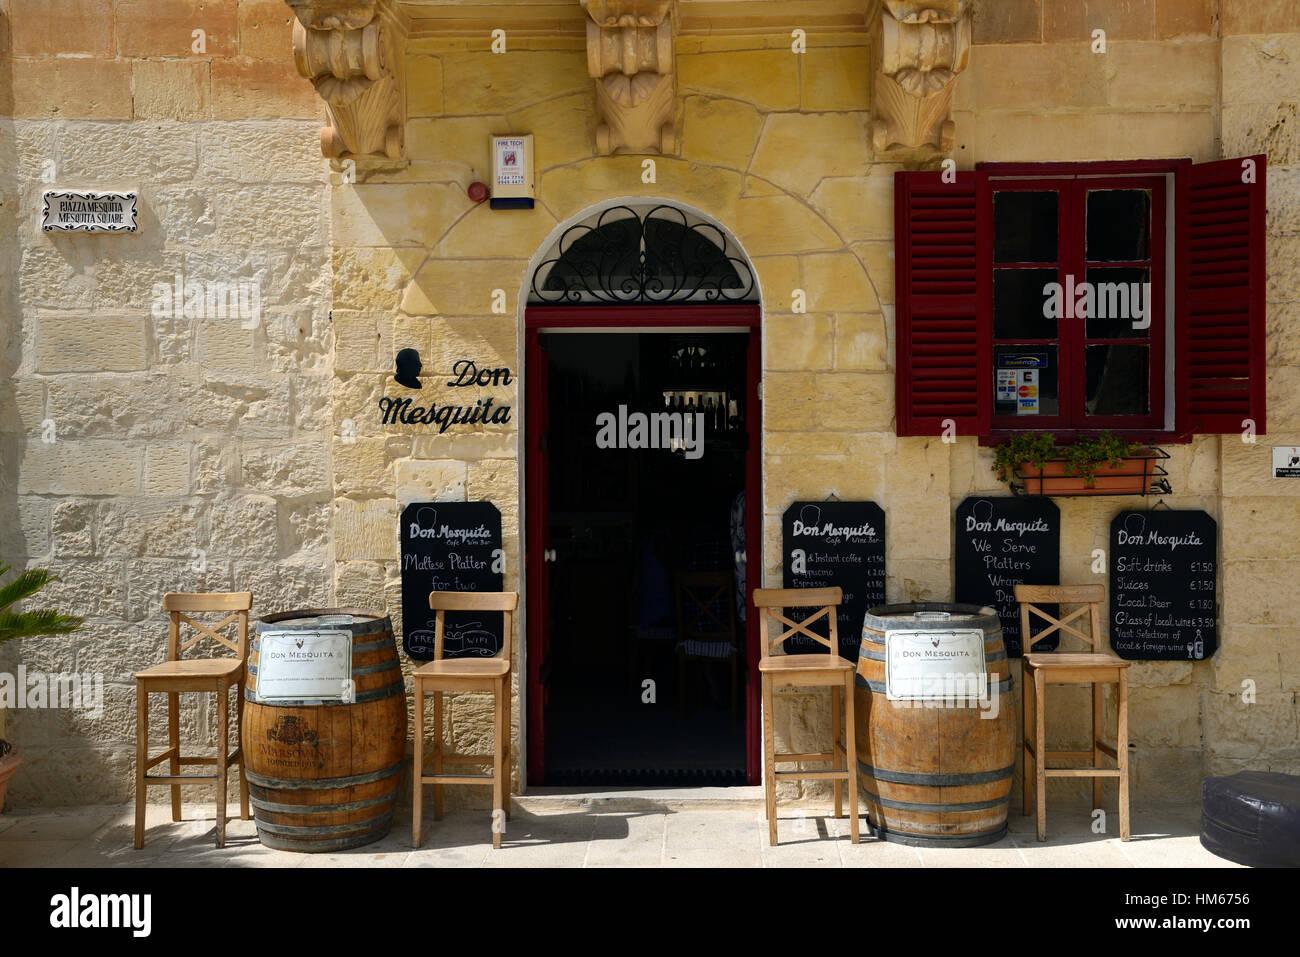 Don mesquita restaurant cafe bar business entrance traditional old style shopfront streets Valletta Malta - Stock Image